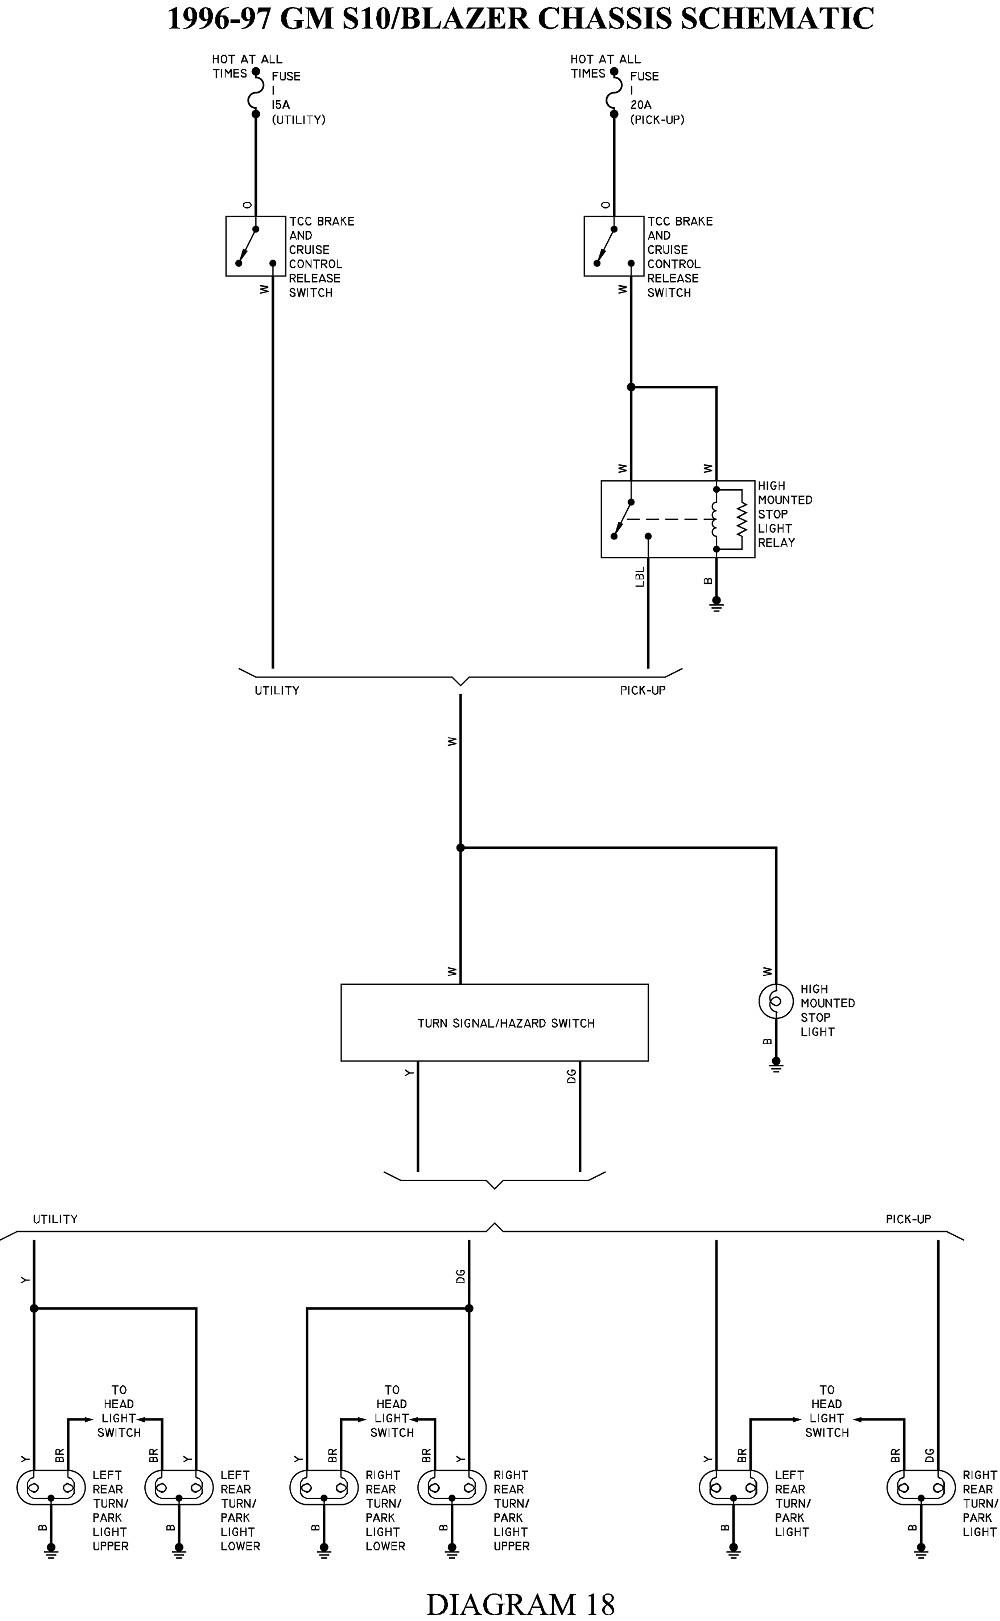 95 Blazer Wiring Diagram | Wiring Diagram